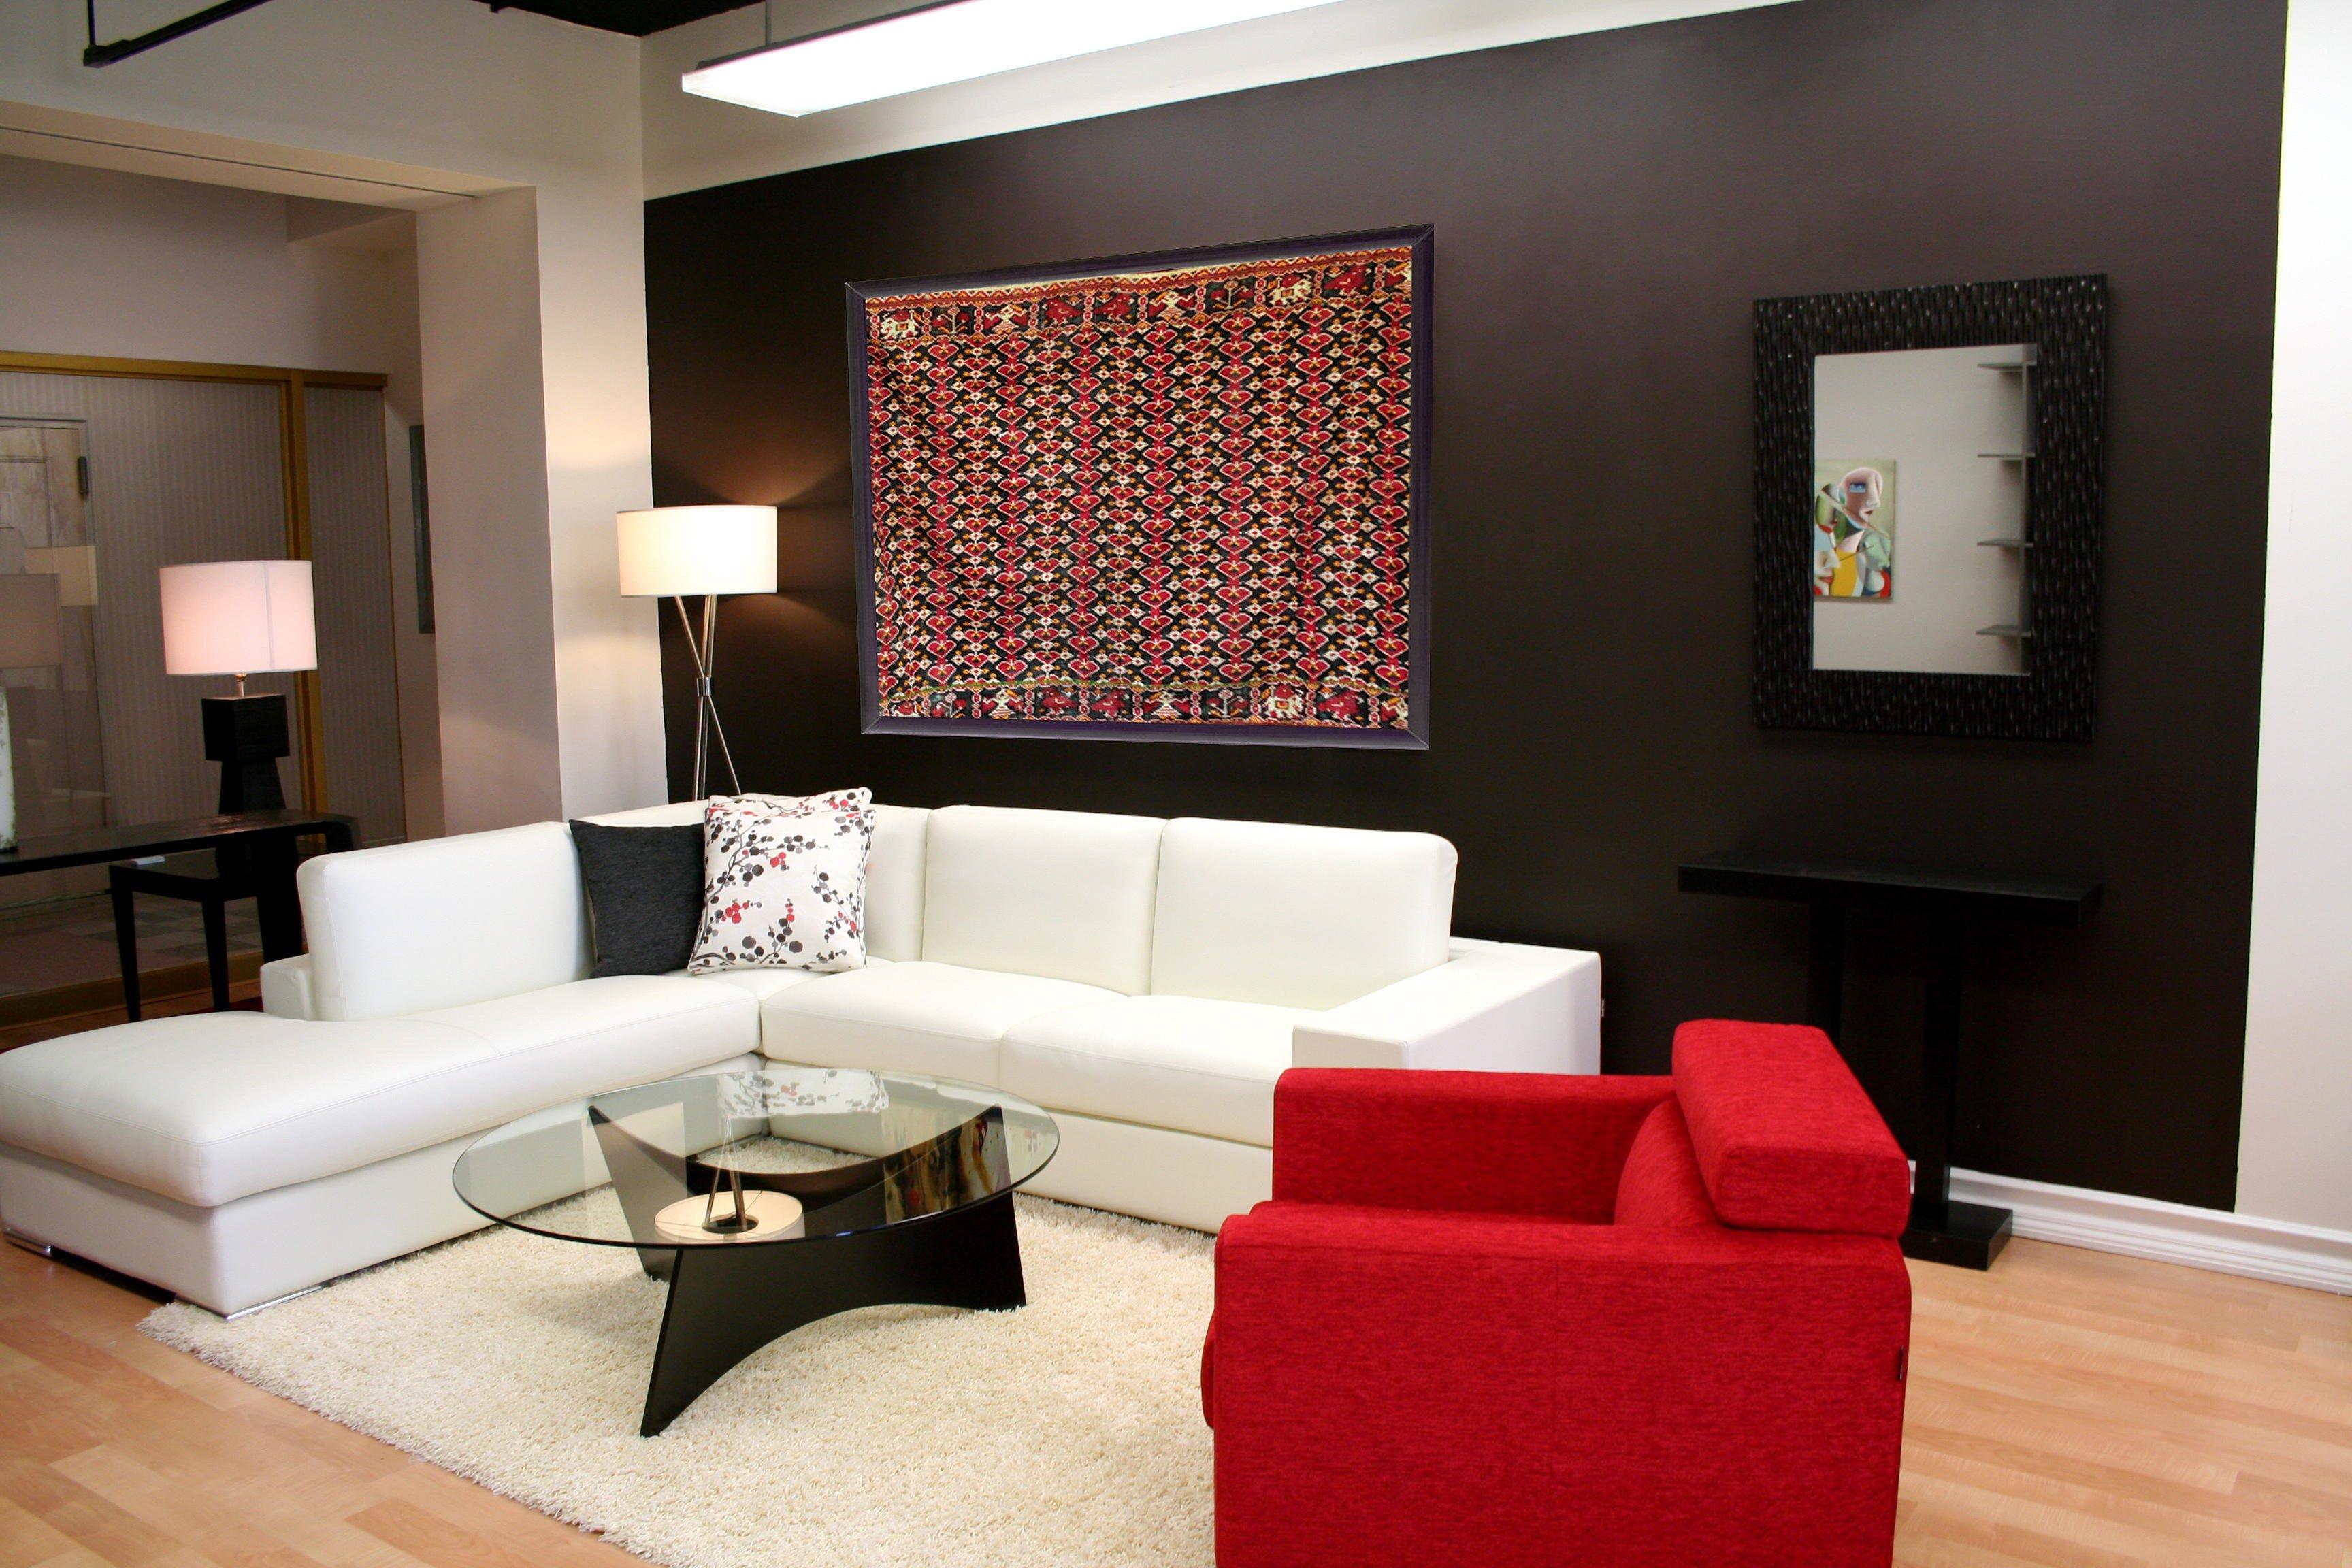 Wall Decor for Home Office Fresh Interior Decor Design Home Office Wall Art Framed 5